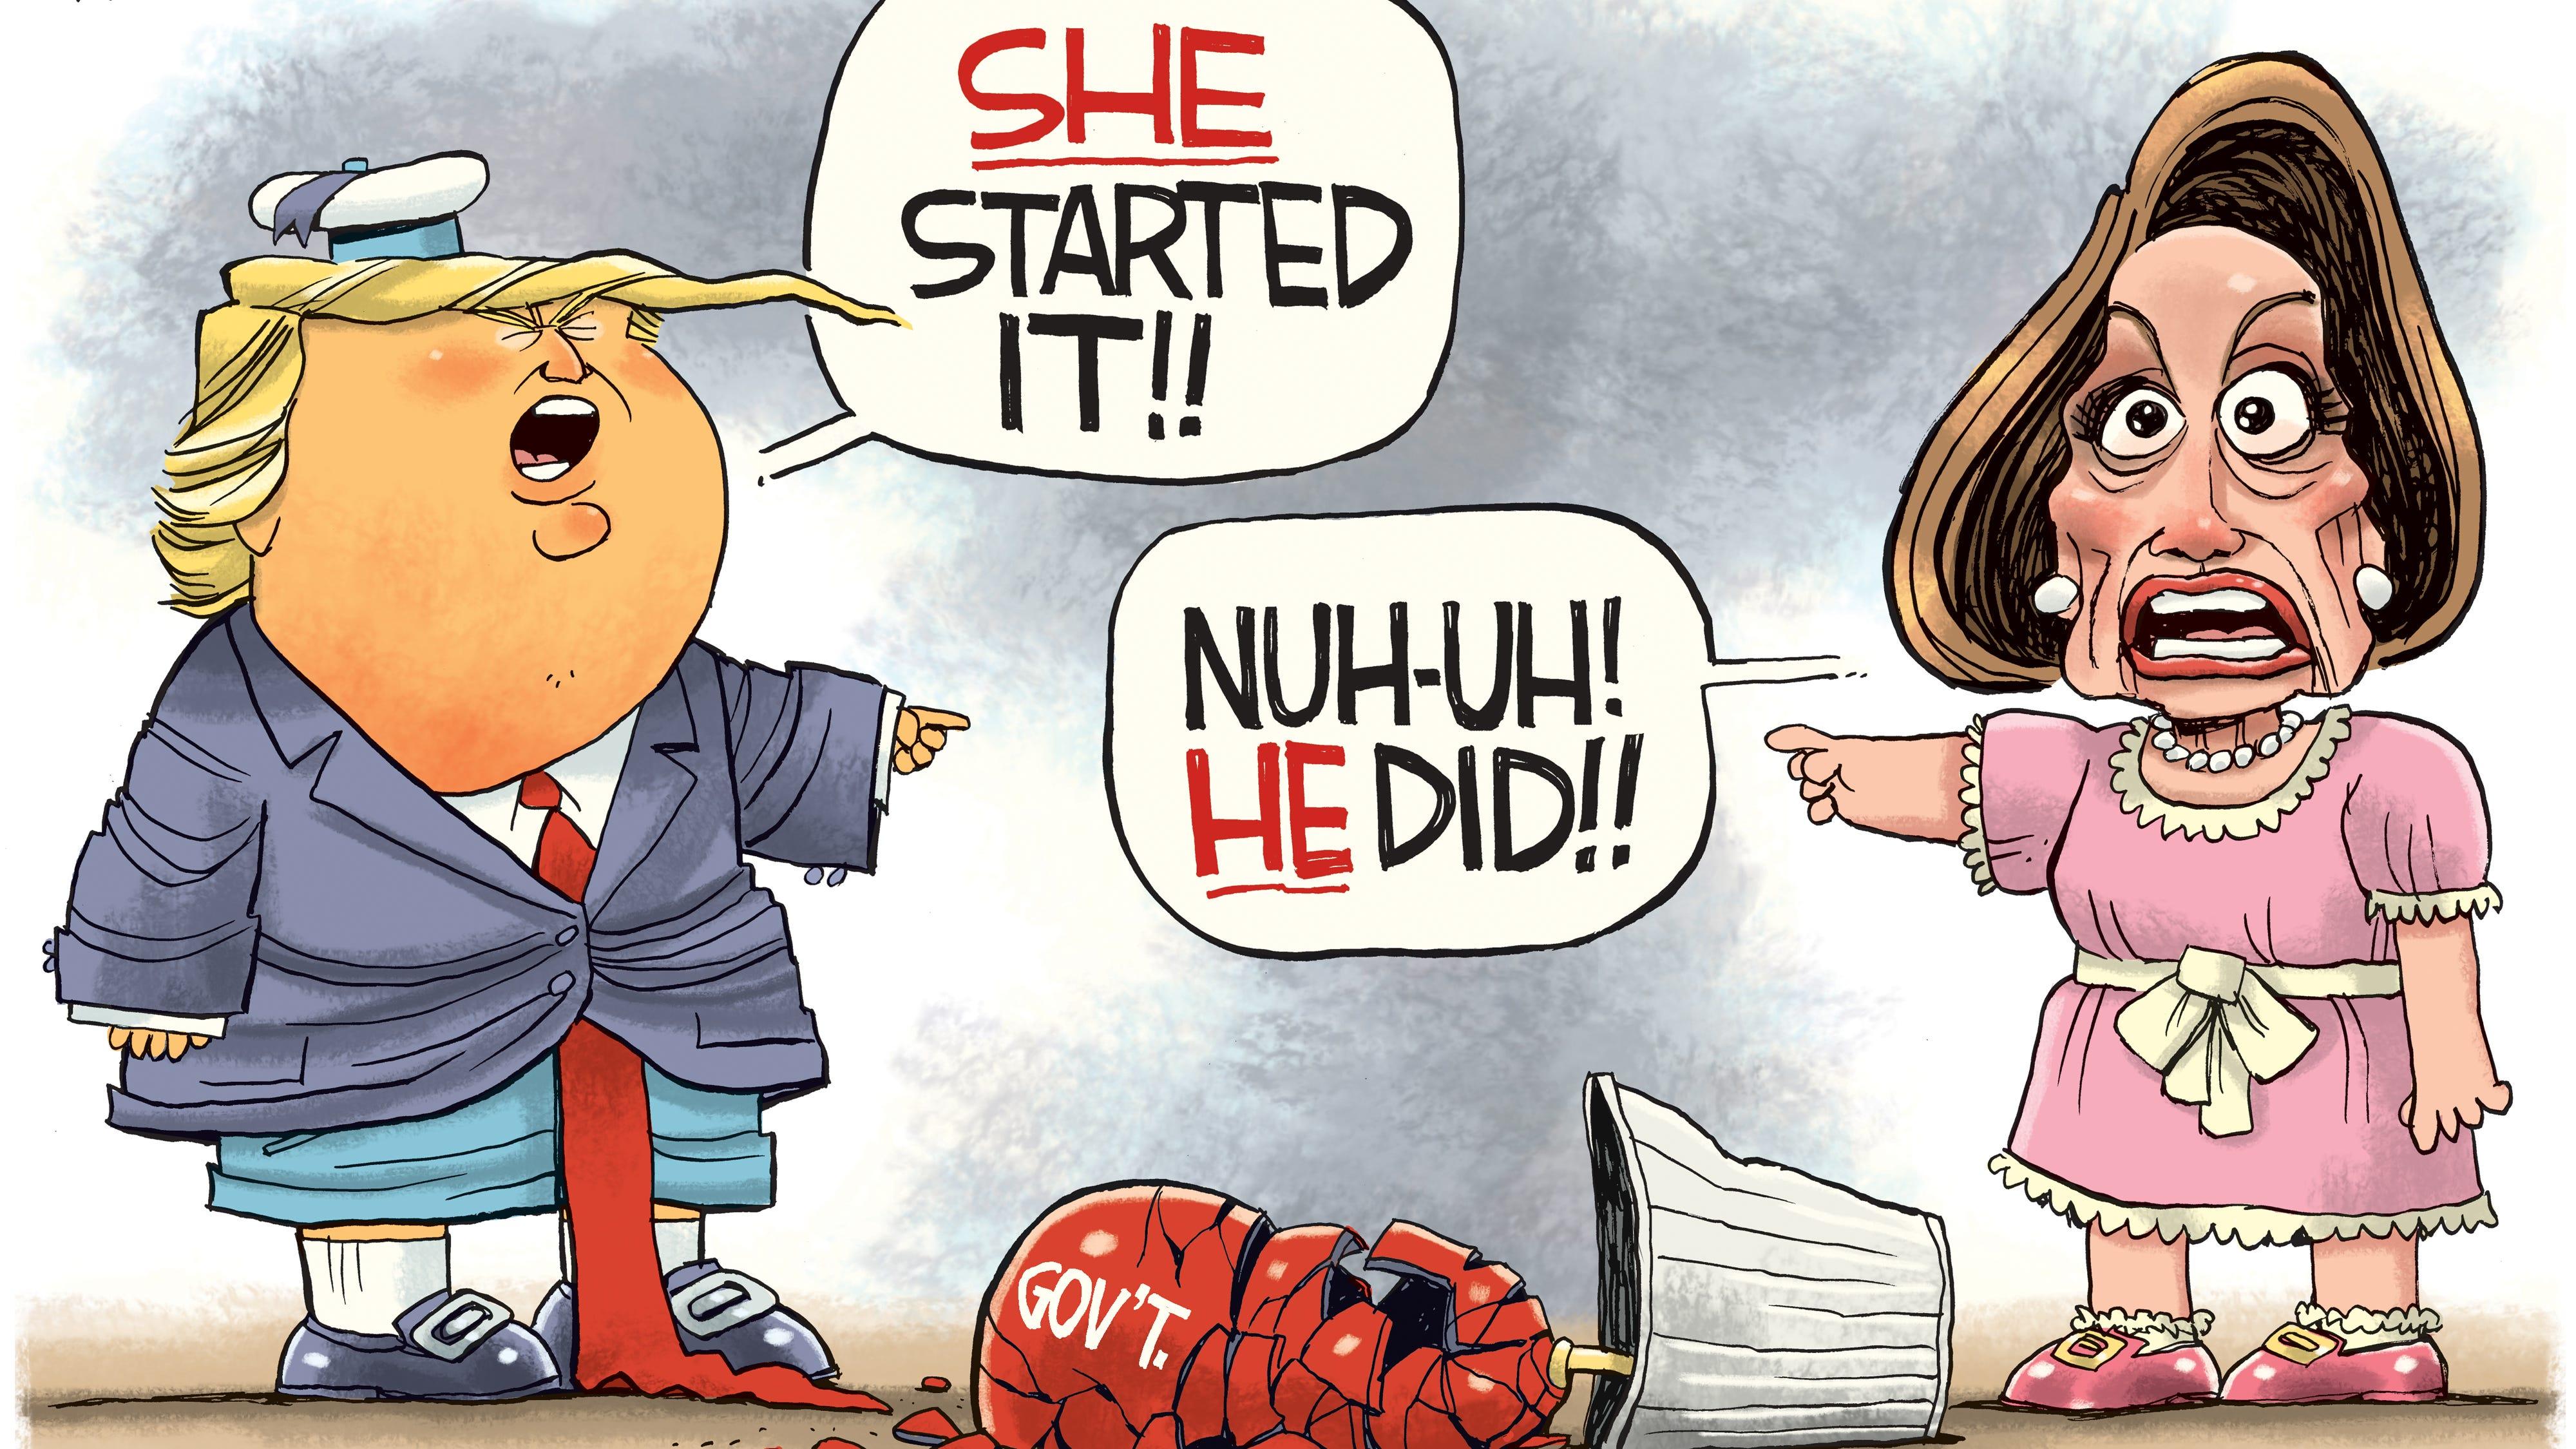 Trump Pelosi brats